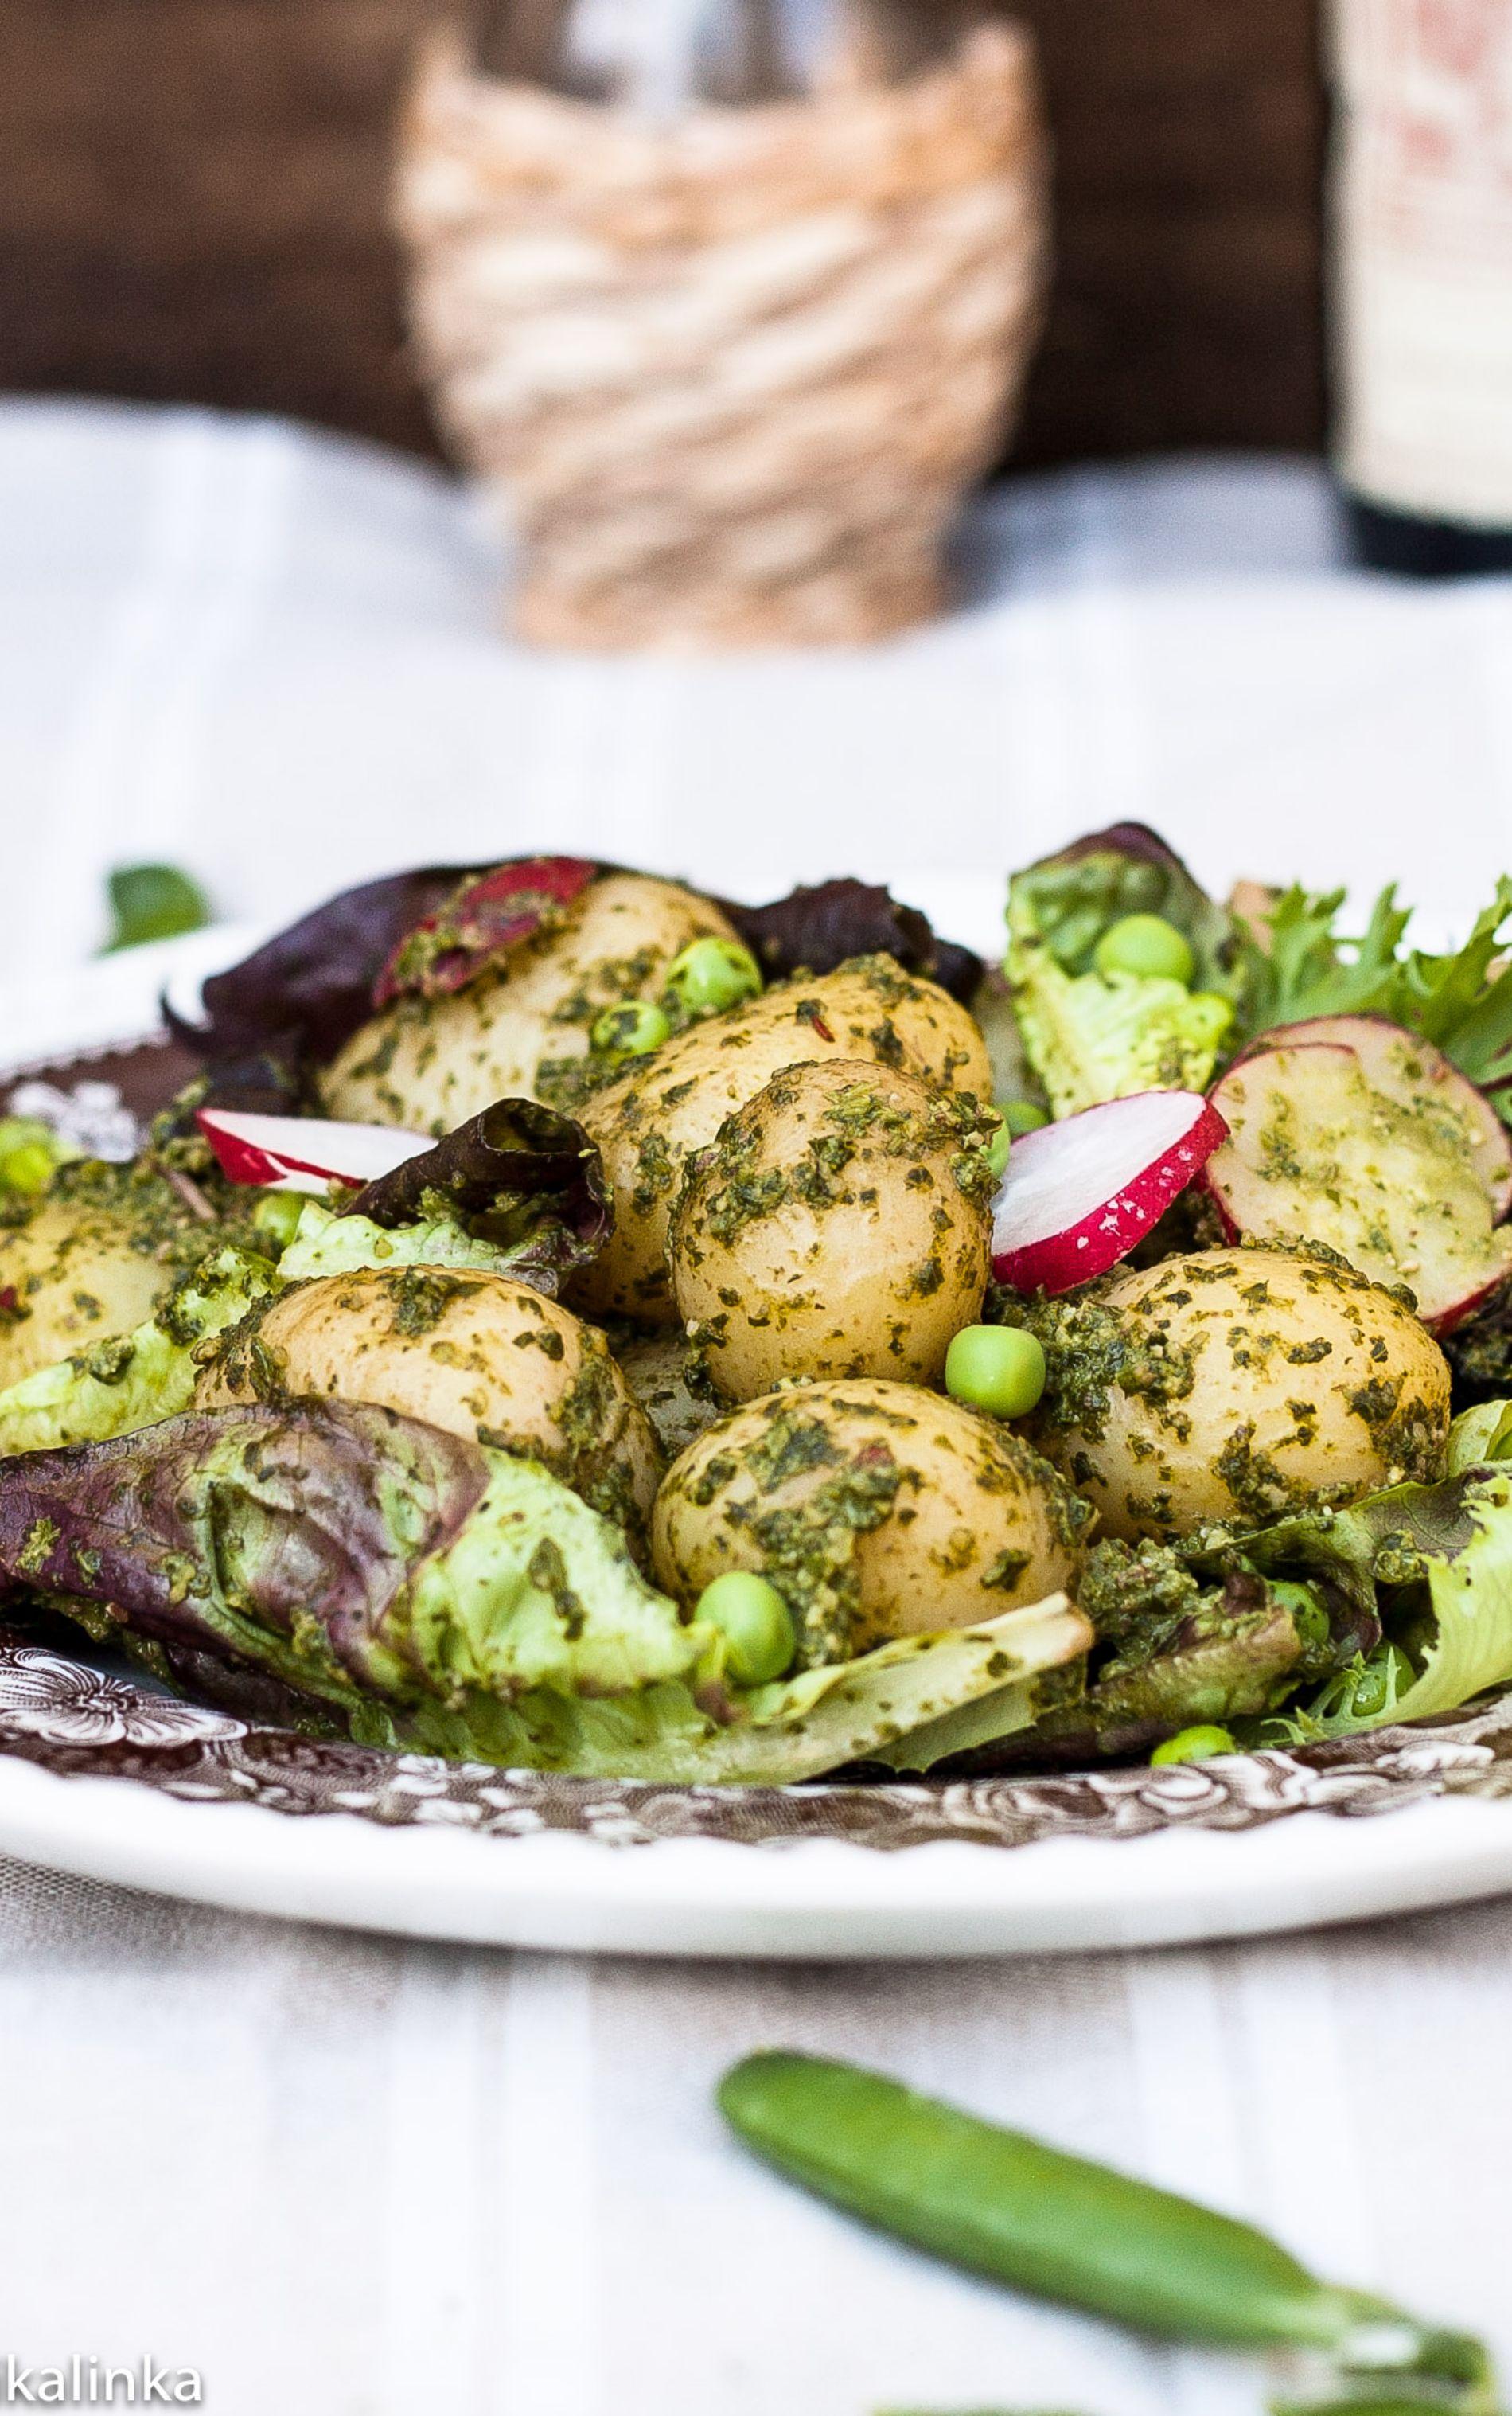 Spinach and walnut pesto potato salad cocina pinterest - Comidas vegetarianas ricas ...